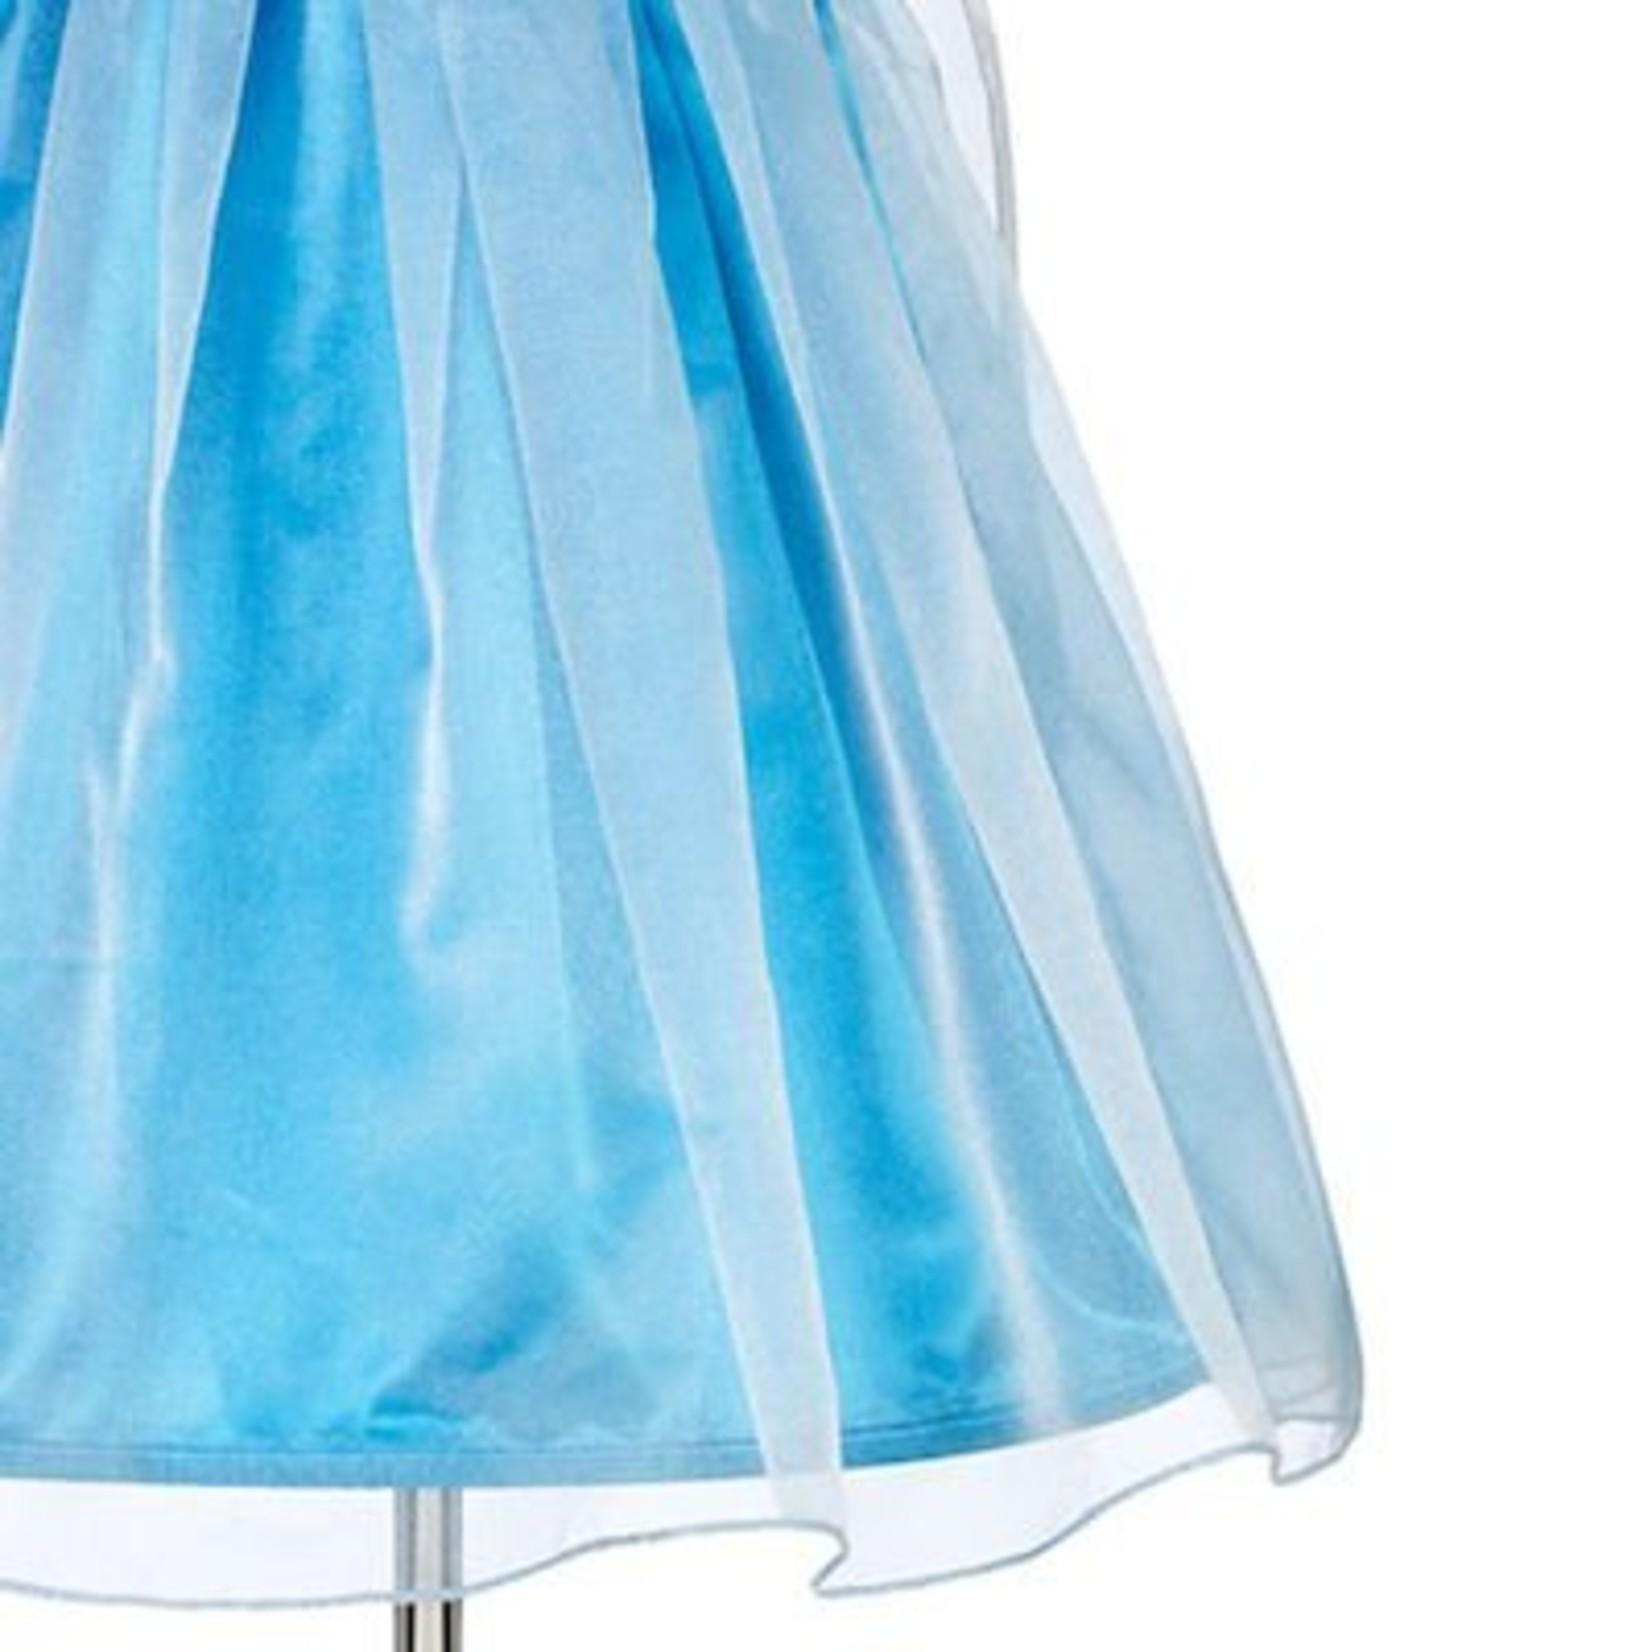 Souza for kids Souza for Kids Lillina jurk met hoepel